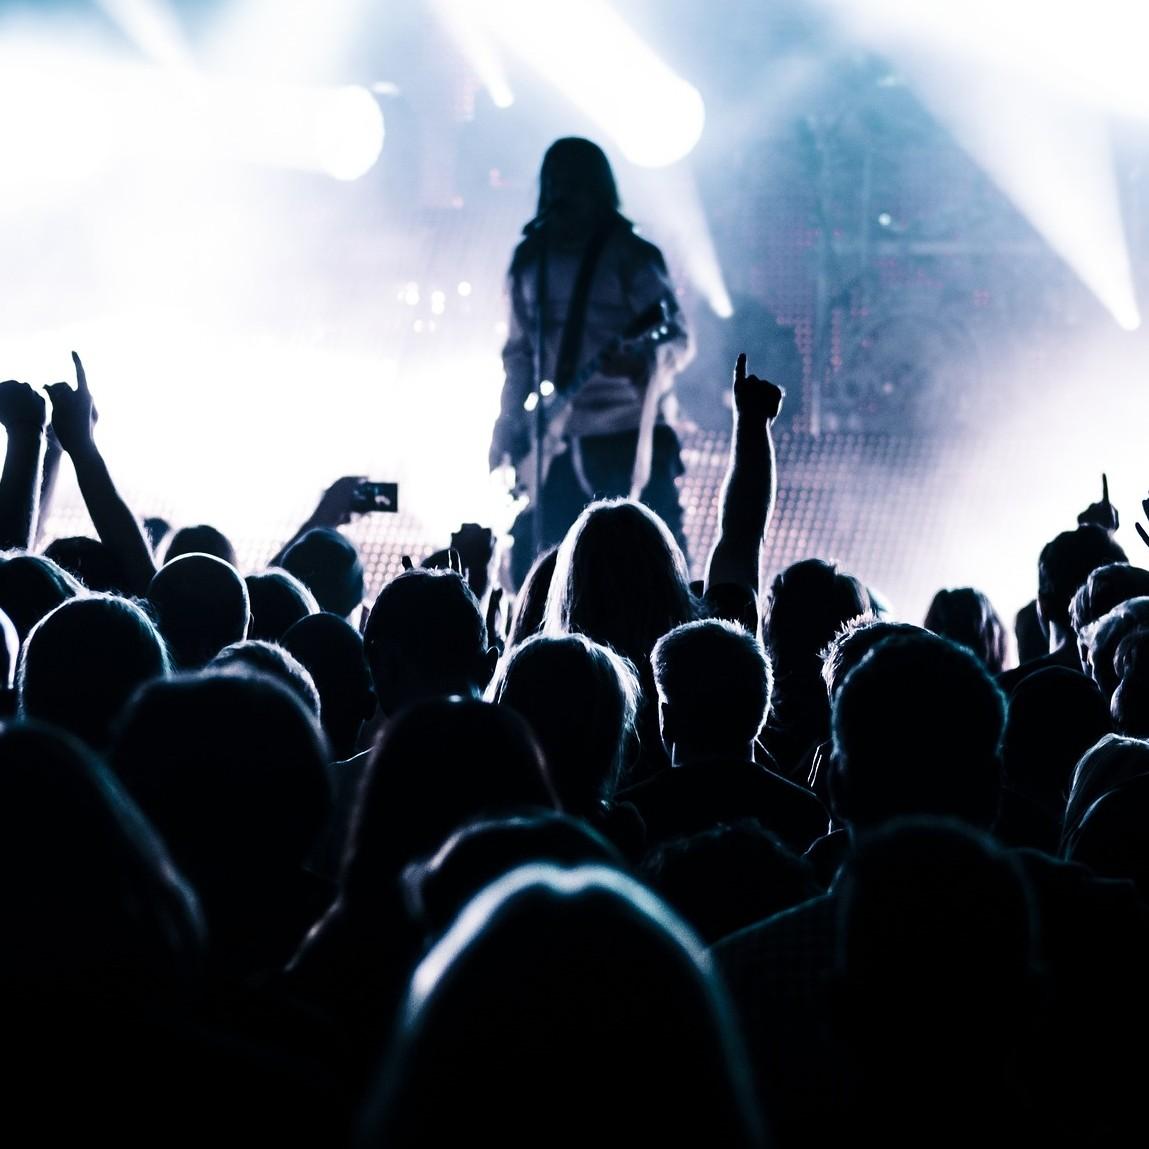 concerto_musica_rock